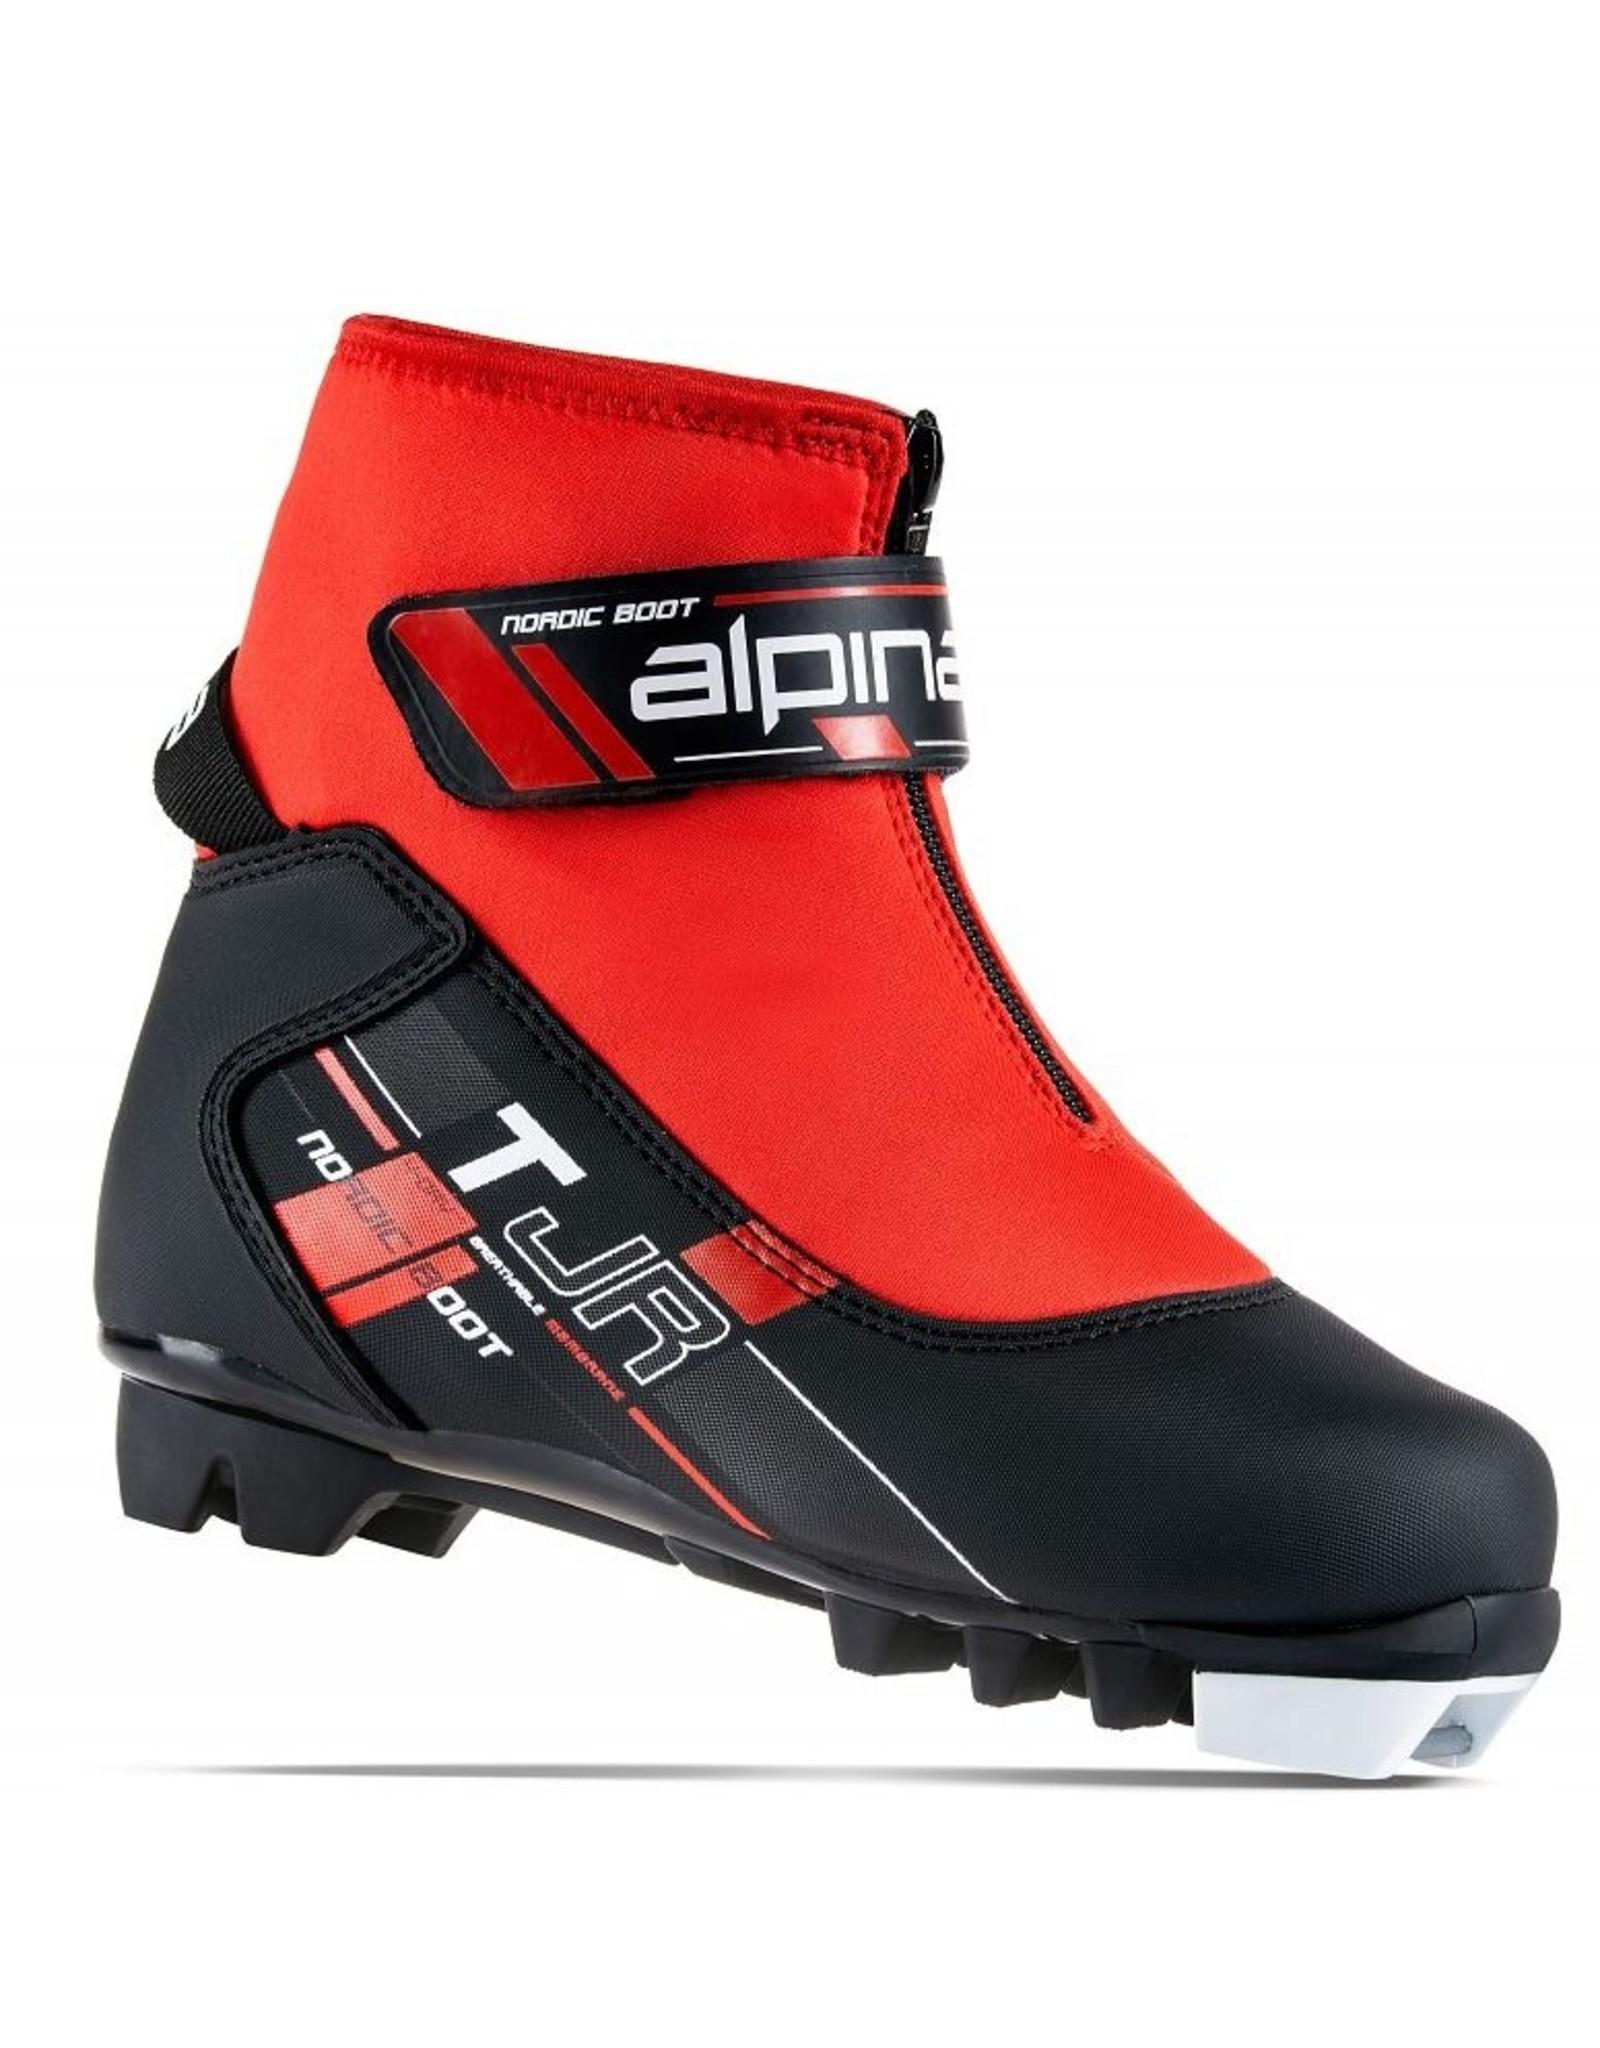 ALPINA ALPINA TJ CROSSCOUNTRY SKI BOOT JR BLACK/RED 20